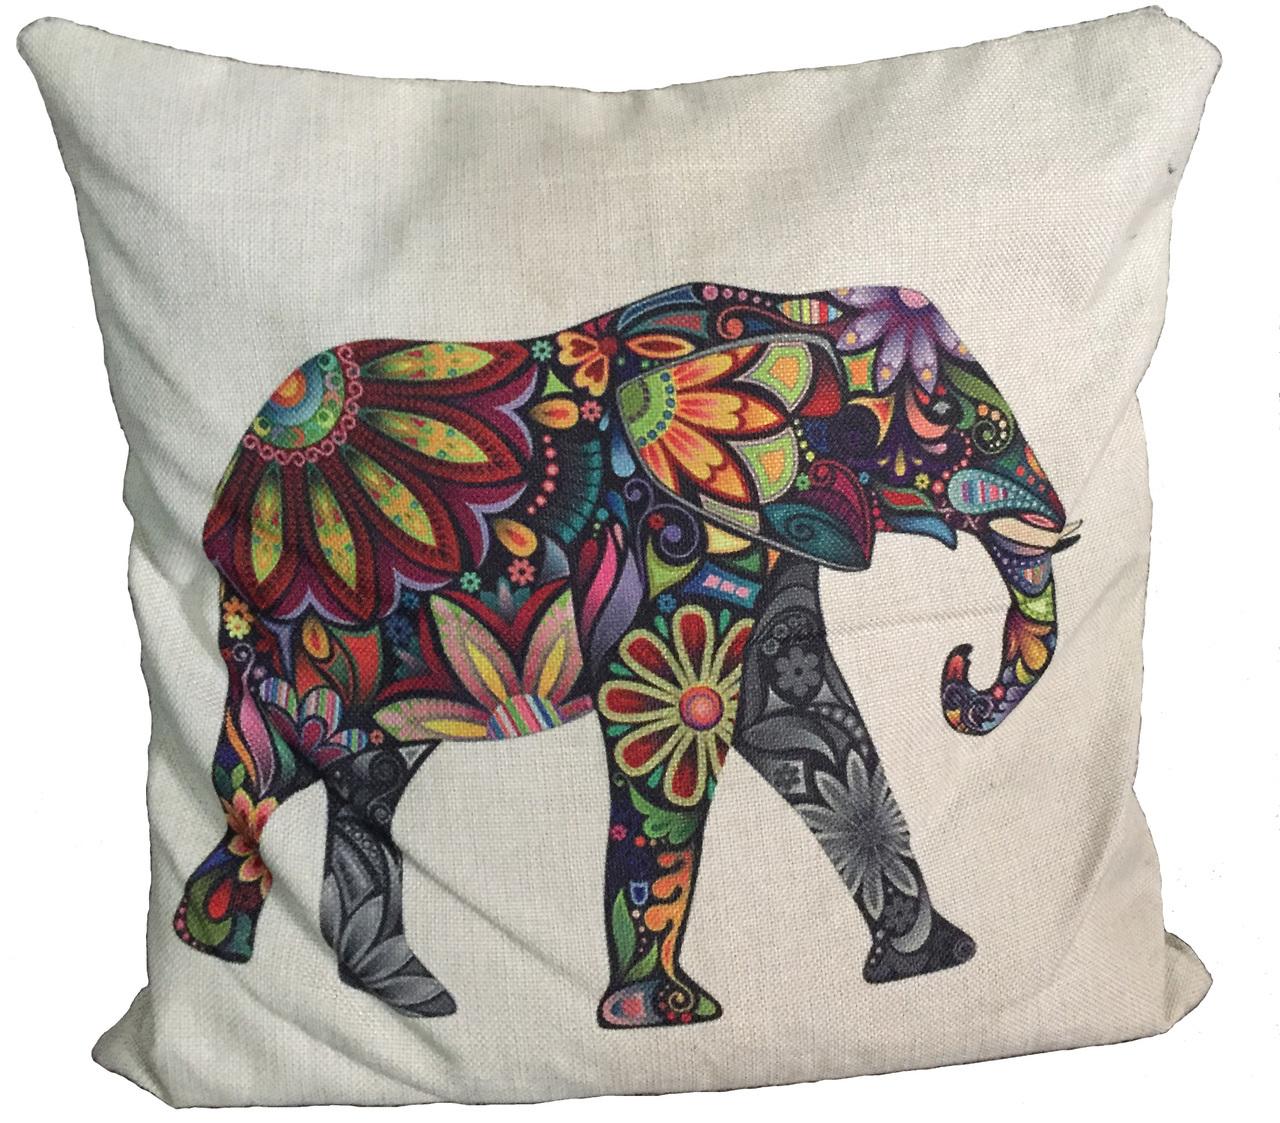 Elehphant Cushion Cover 16x16 $18.99